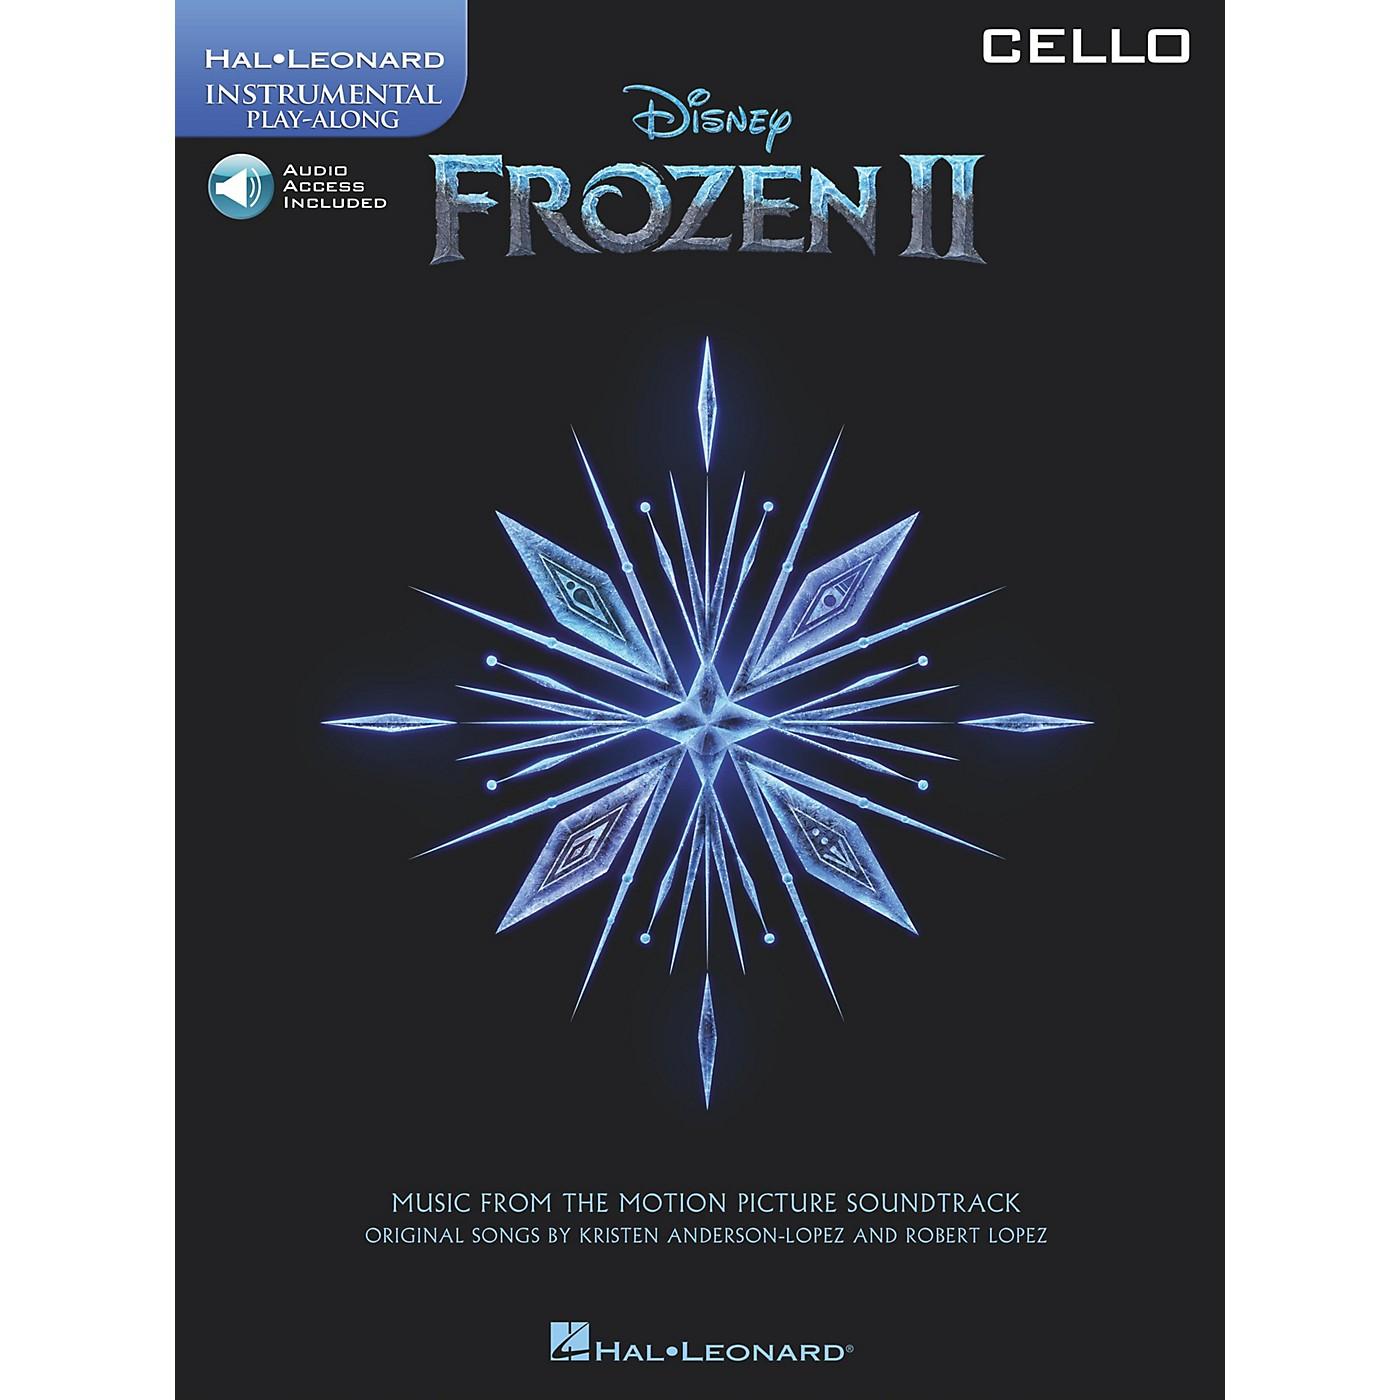 Hal Leonard Frozen II Cello Play-Along Instrumental Songbook Book/Audio Online thumbnail